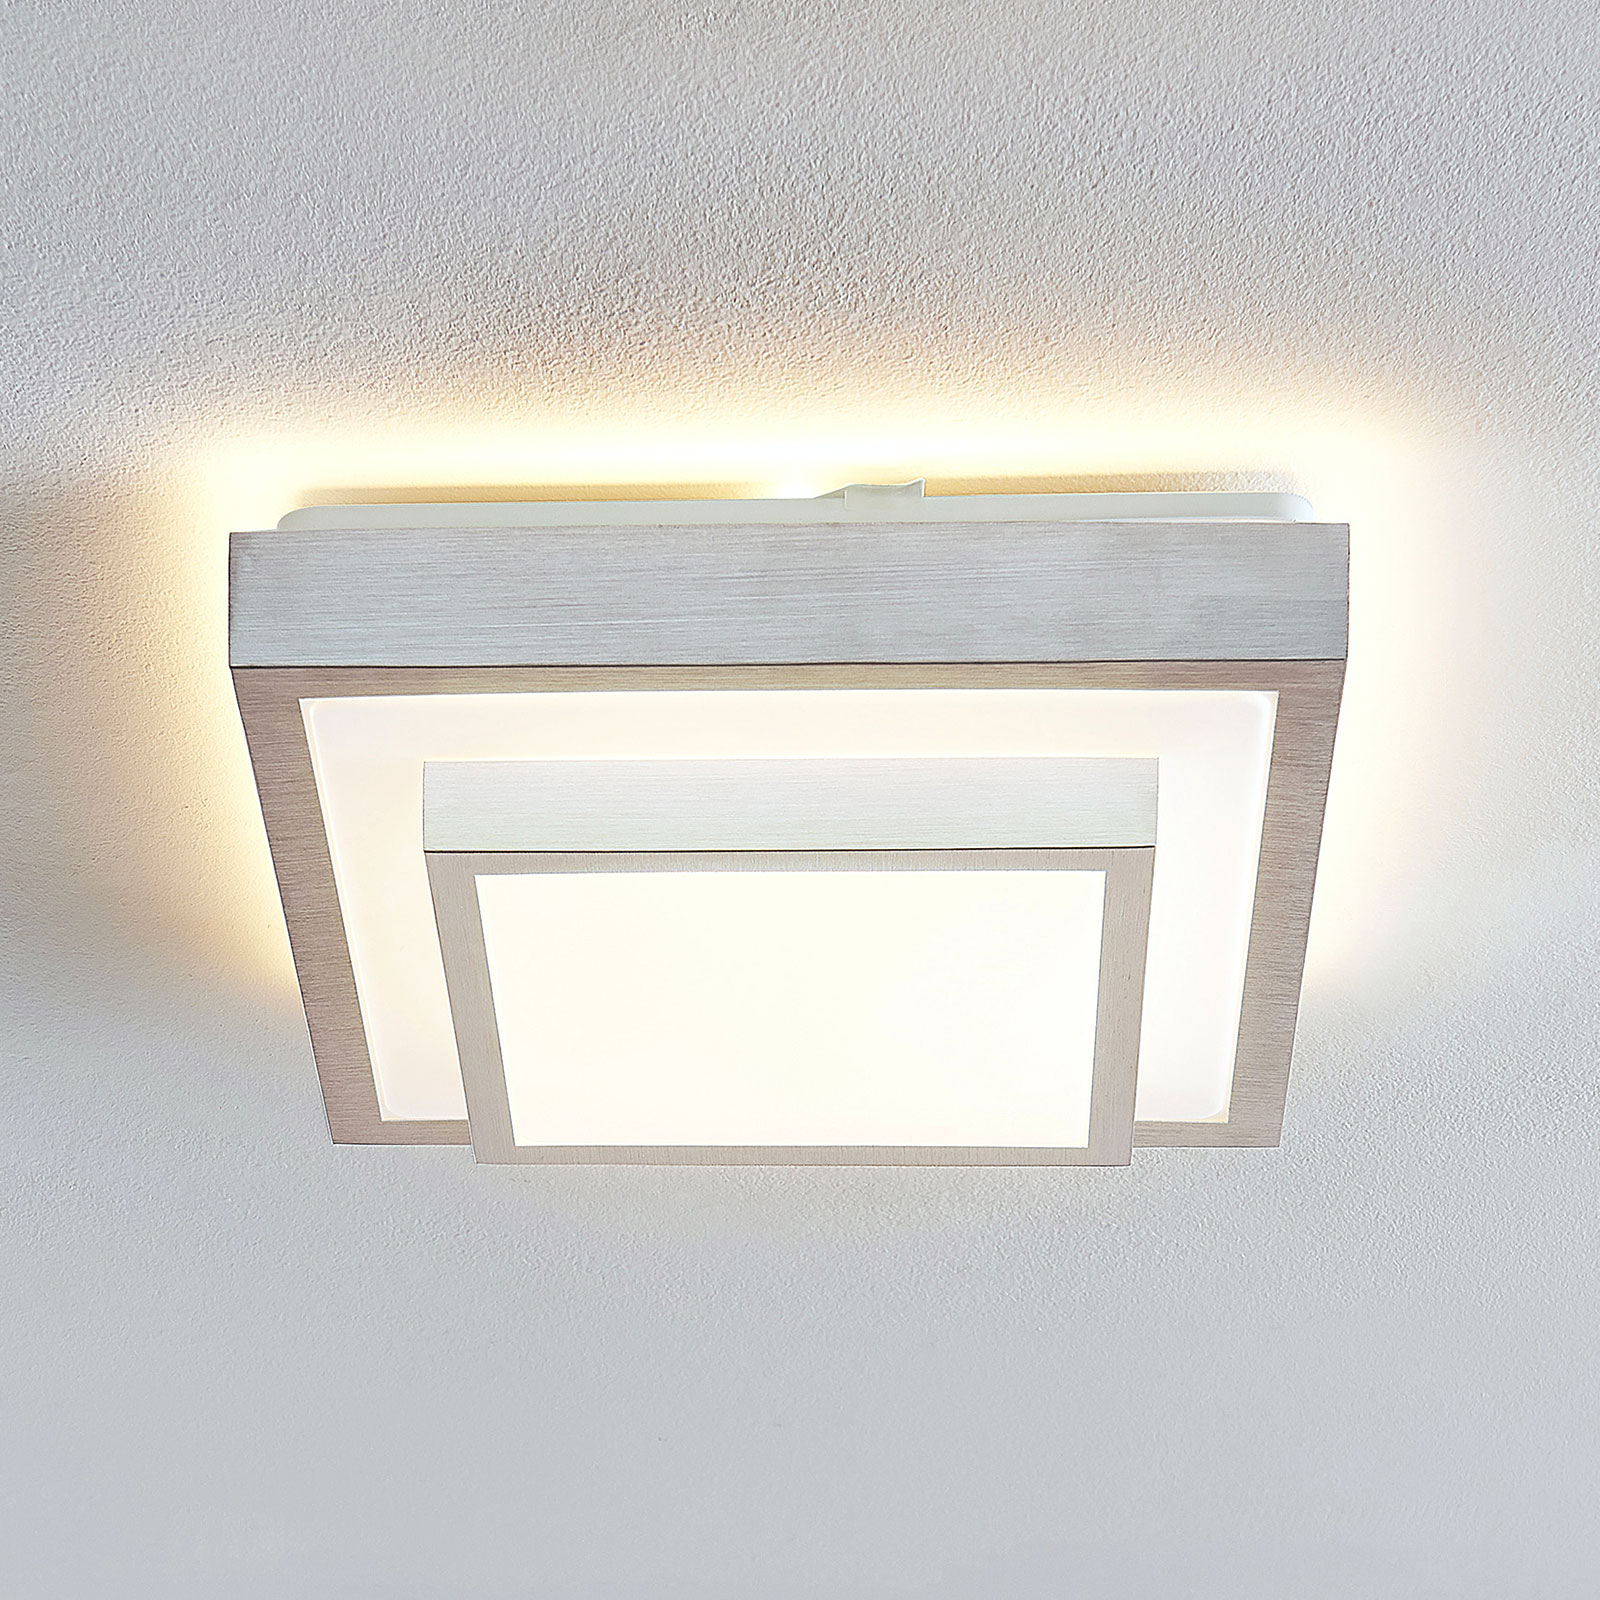 Lindby Mirco LED plafondlamp, hoekig, 32 cm